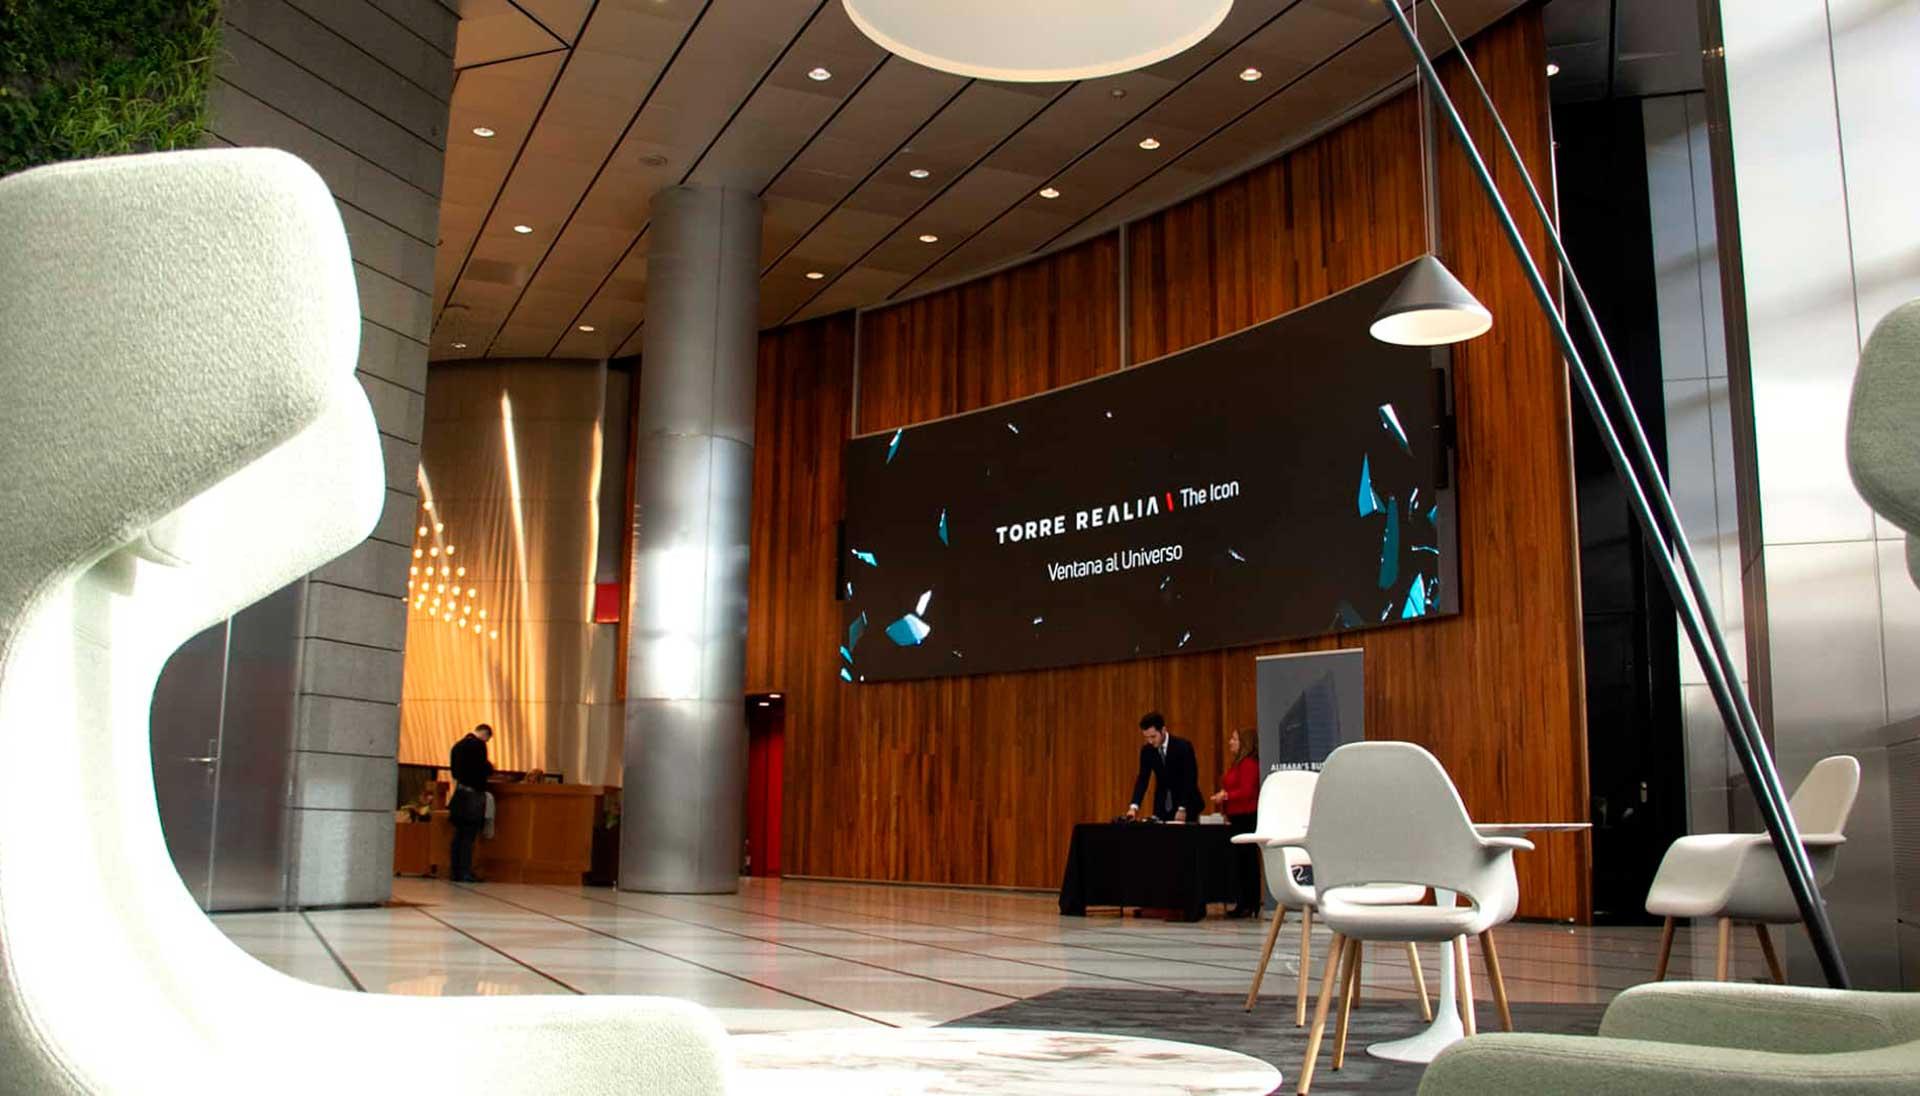 Digitalización con pantallas en edificios inteligentes